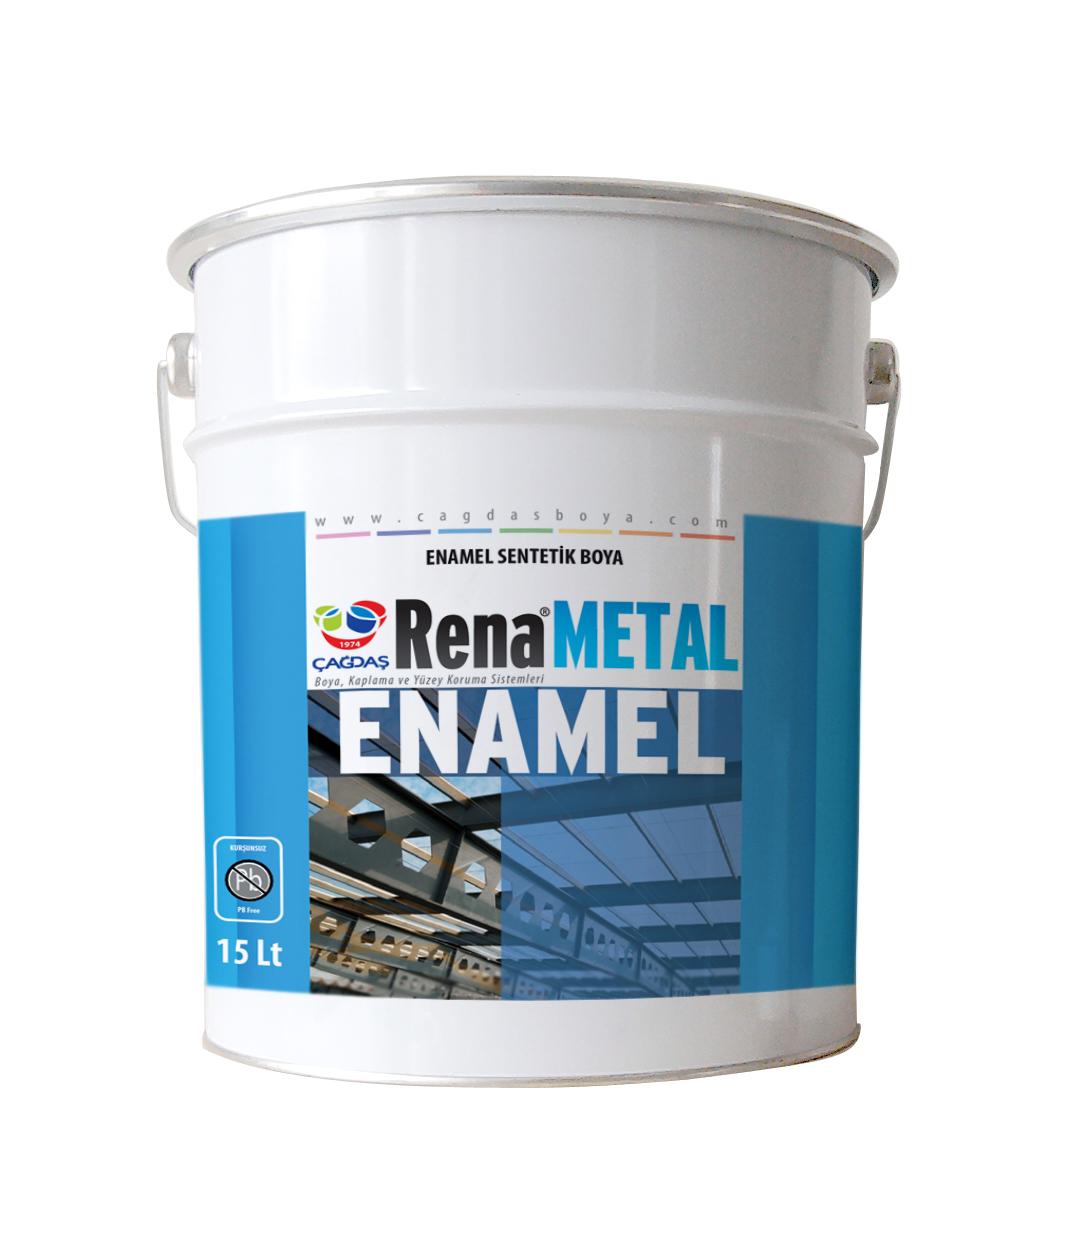 Rena Metal Enamel